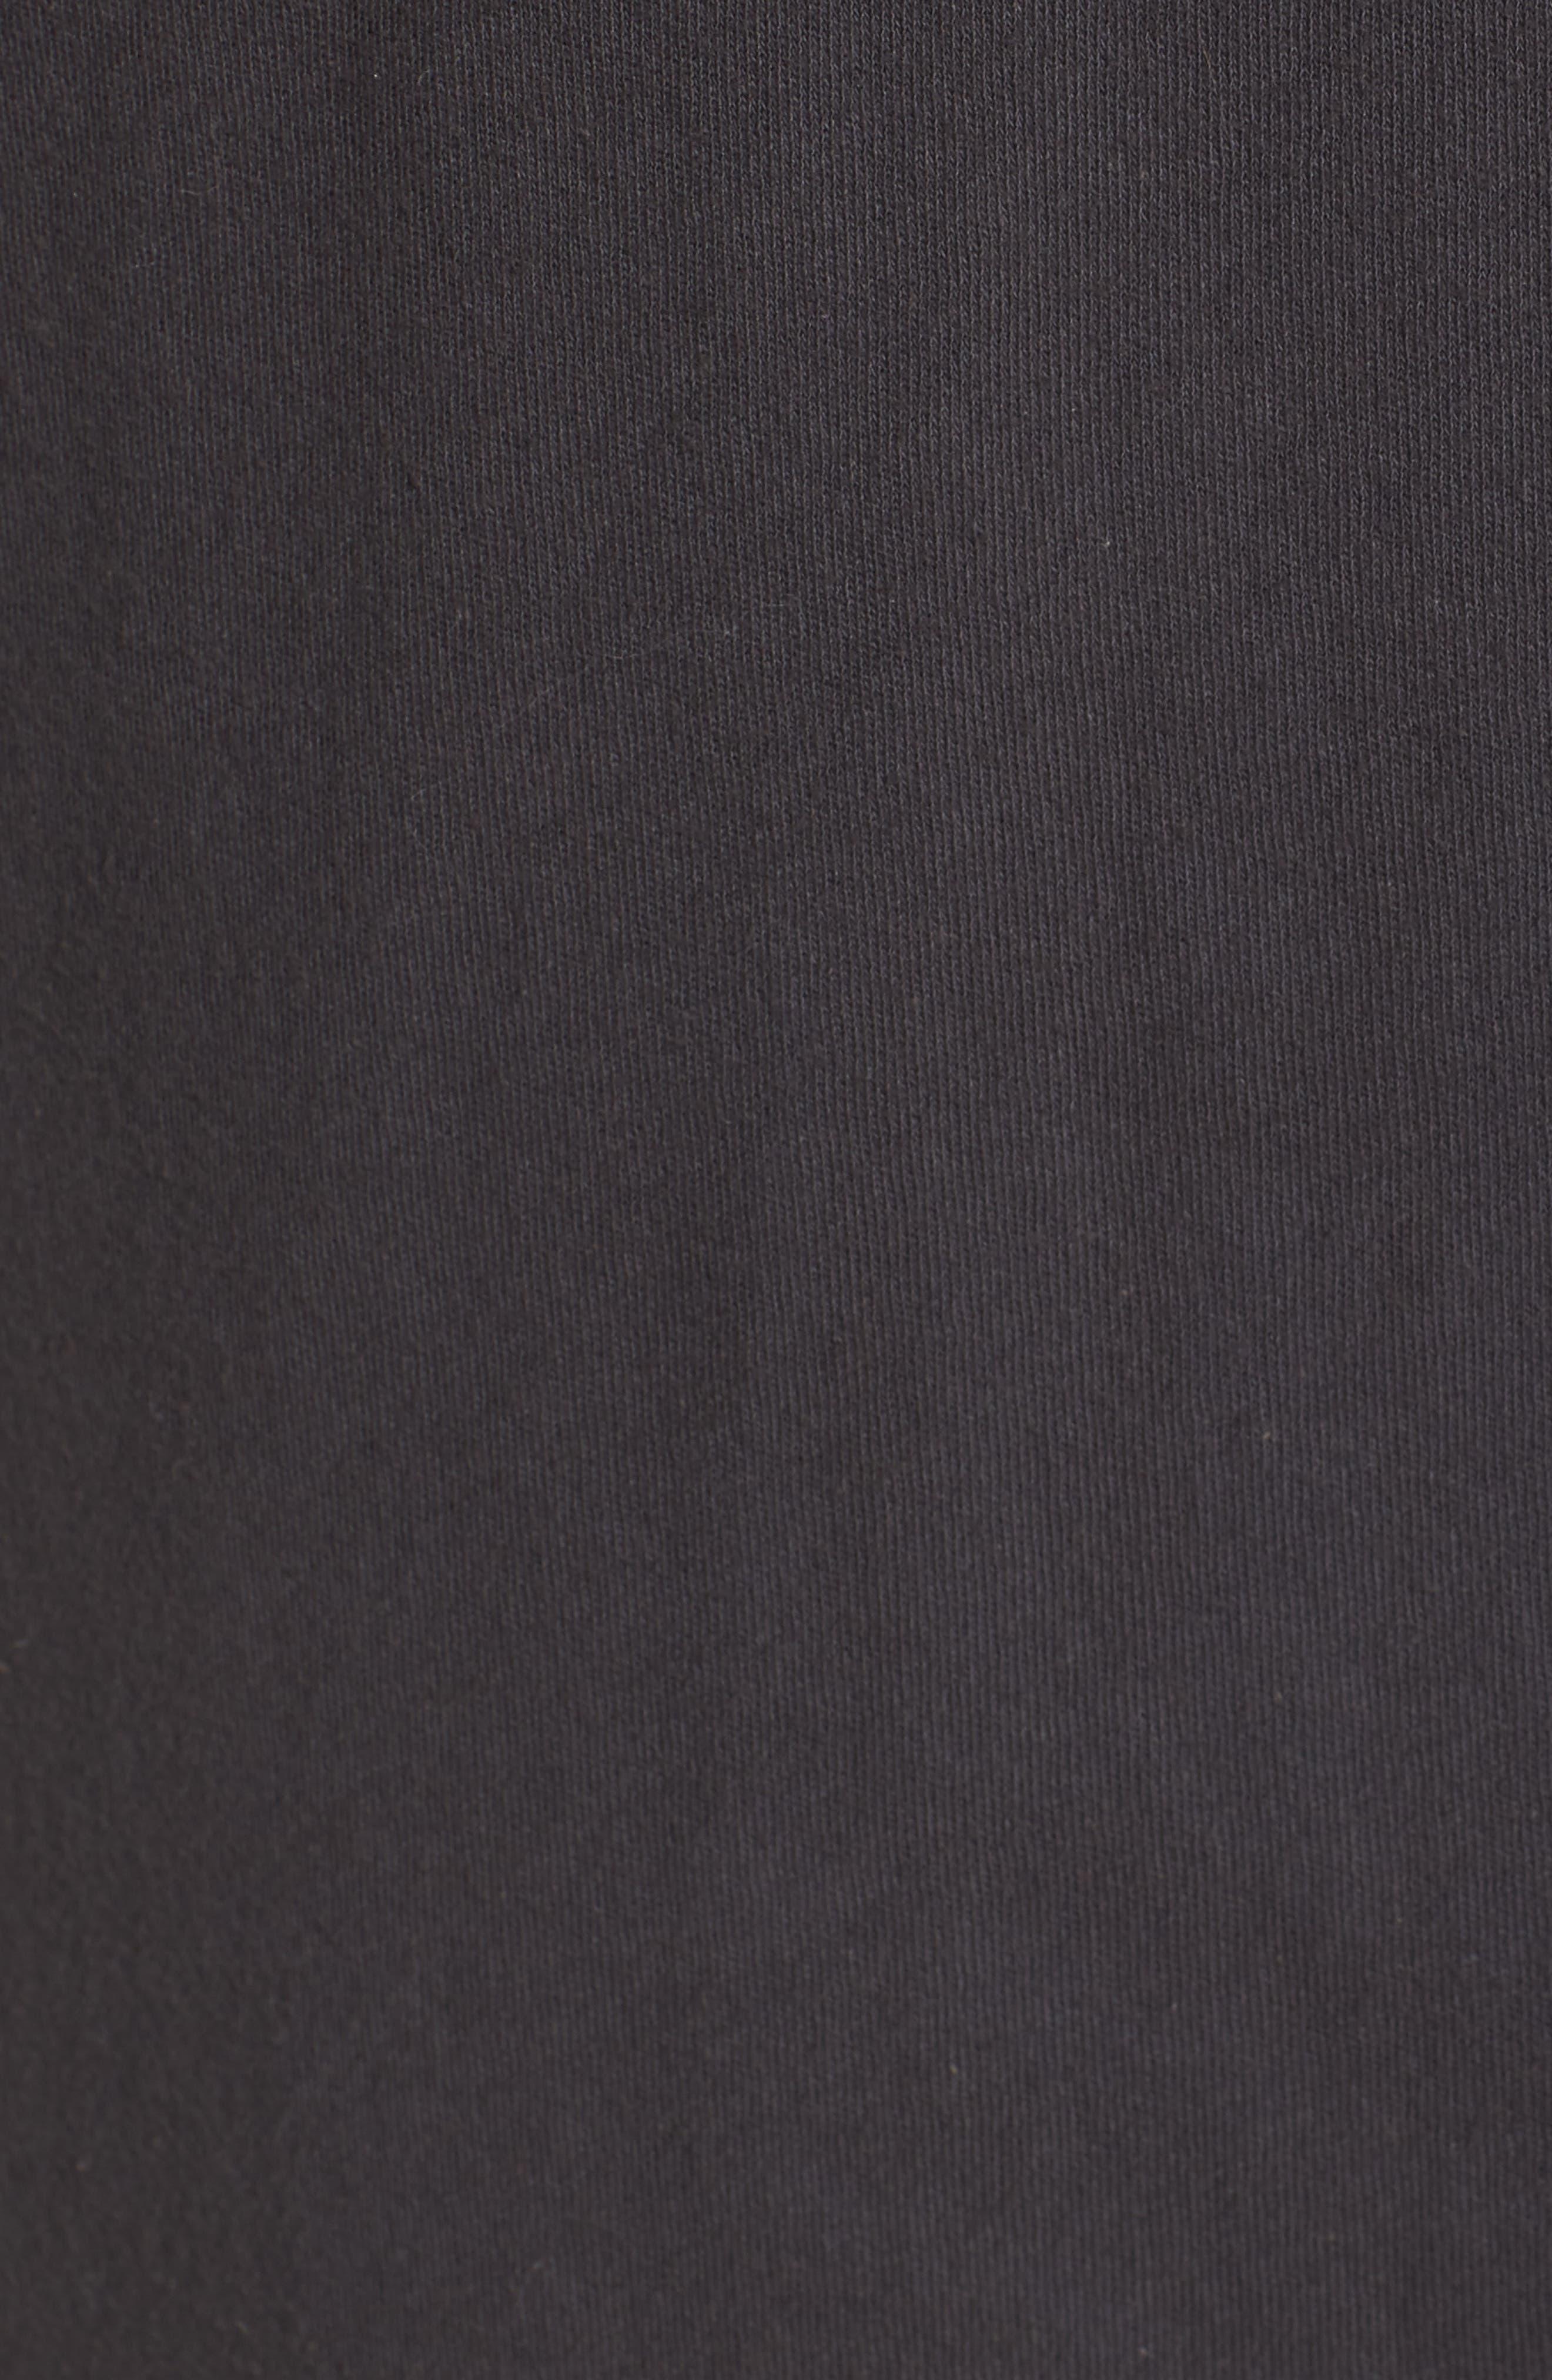 Hoodie Cardigan,                             Alternate thumbnail 6, color,                             Carbon